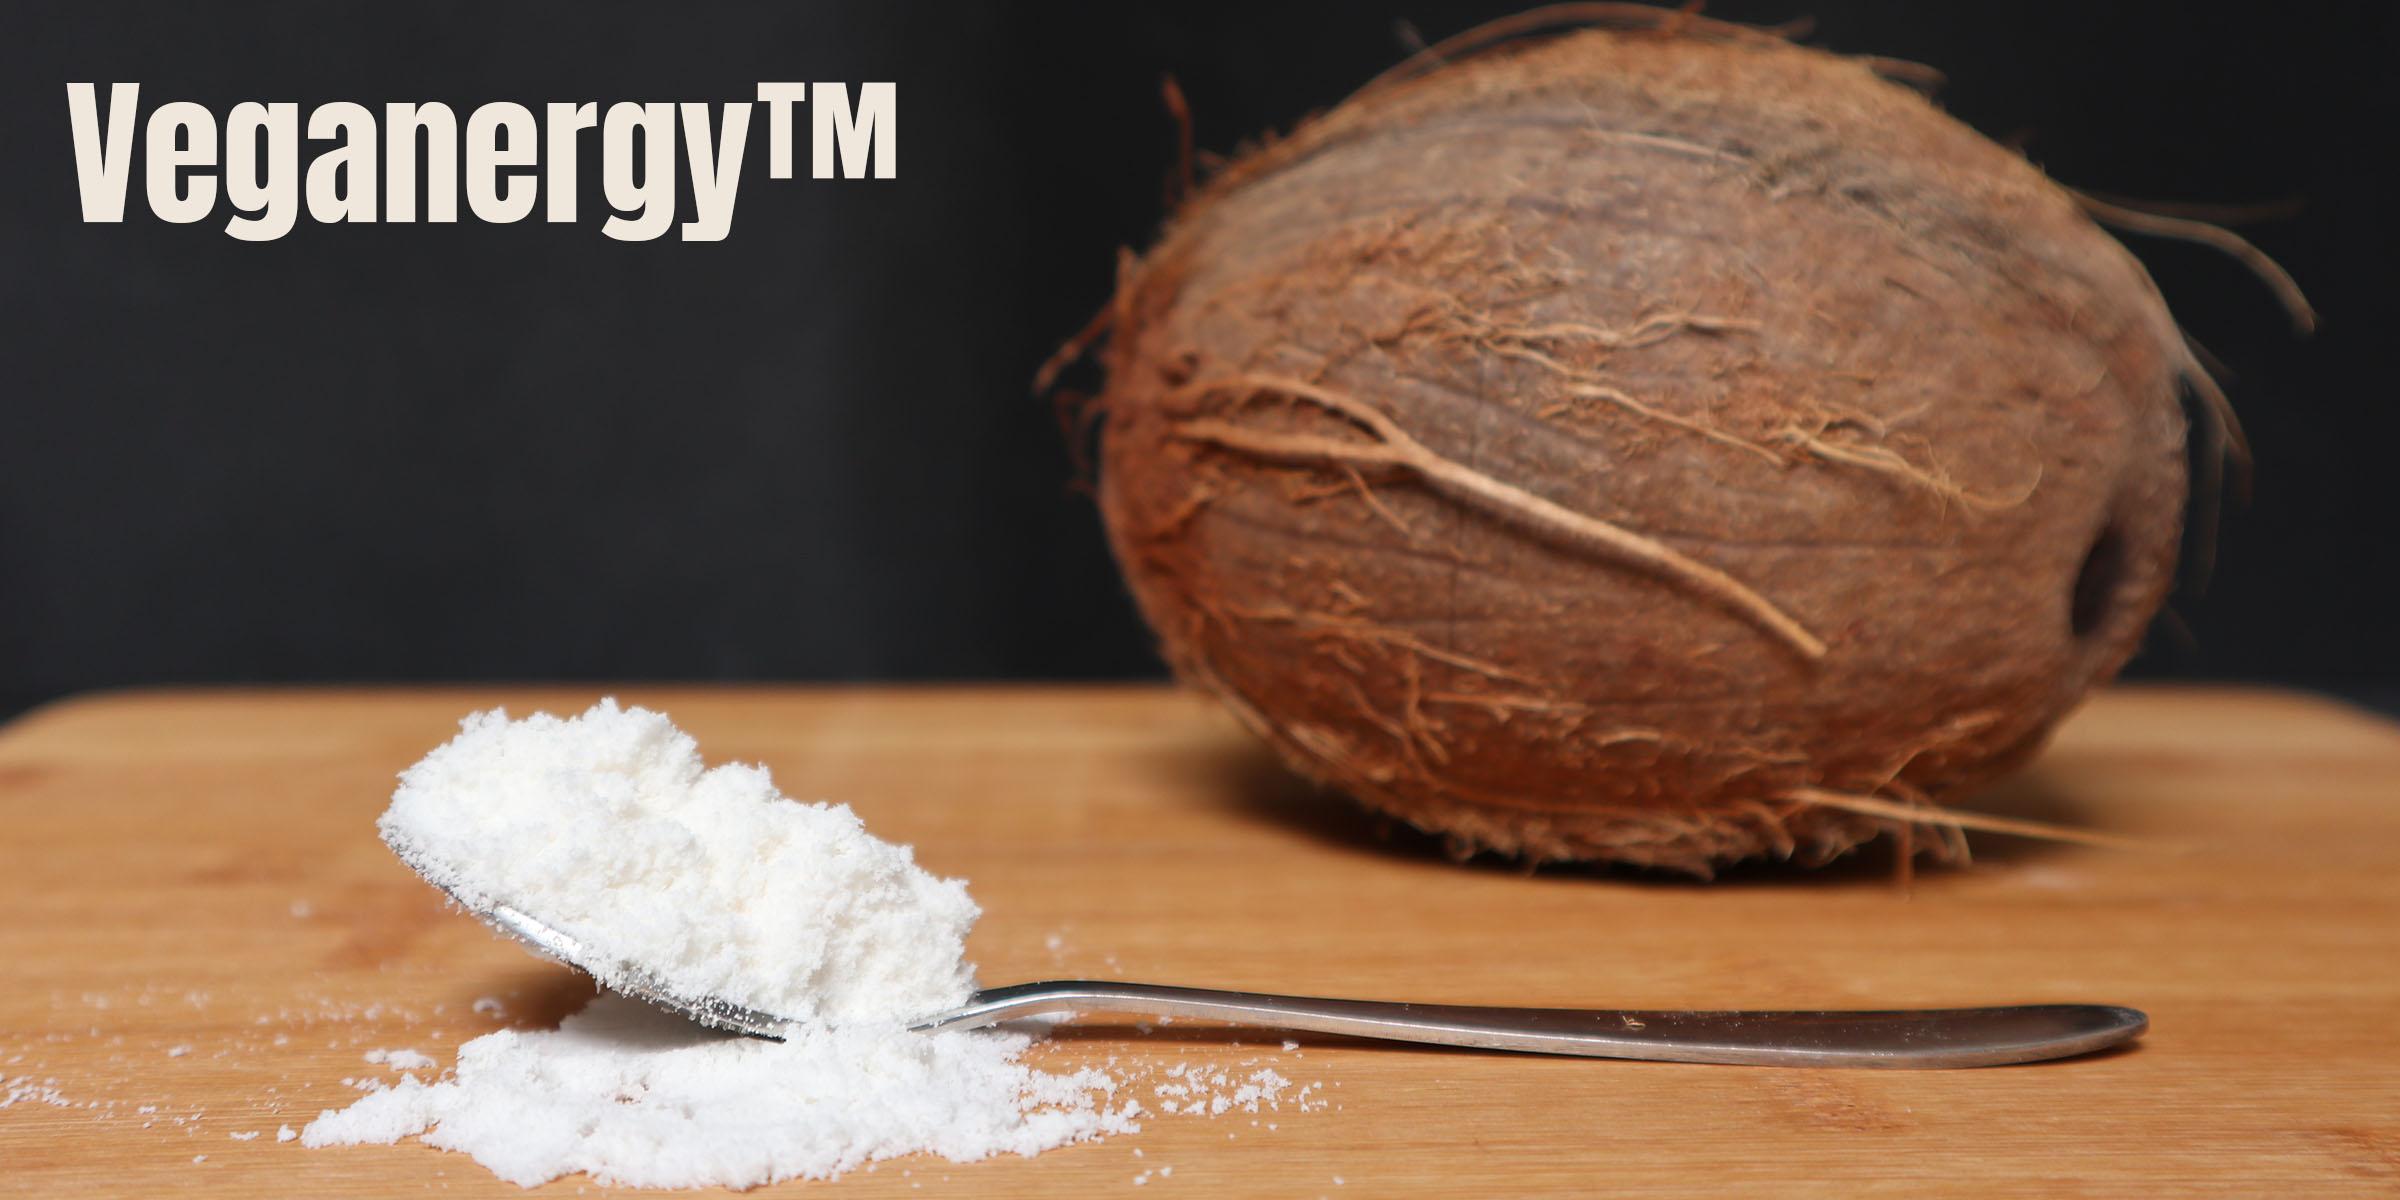 Veganergy Vegan MCT Powder